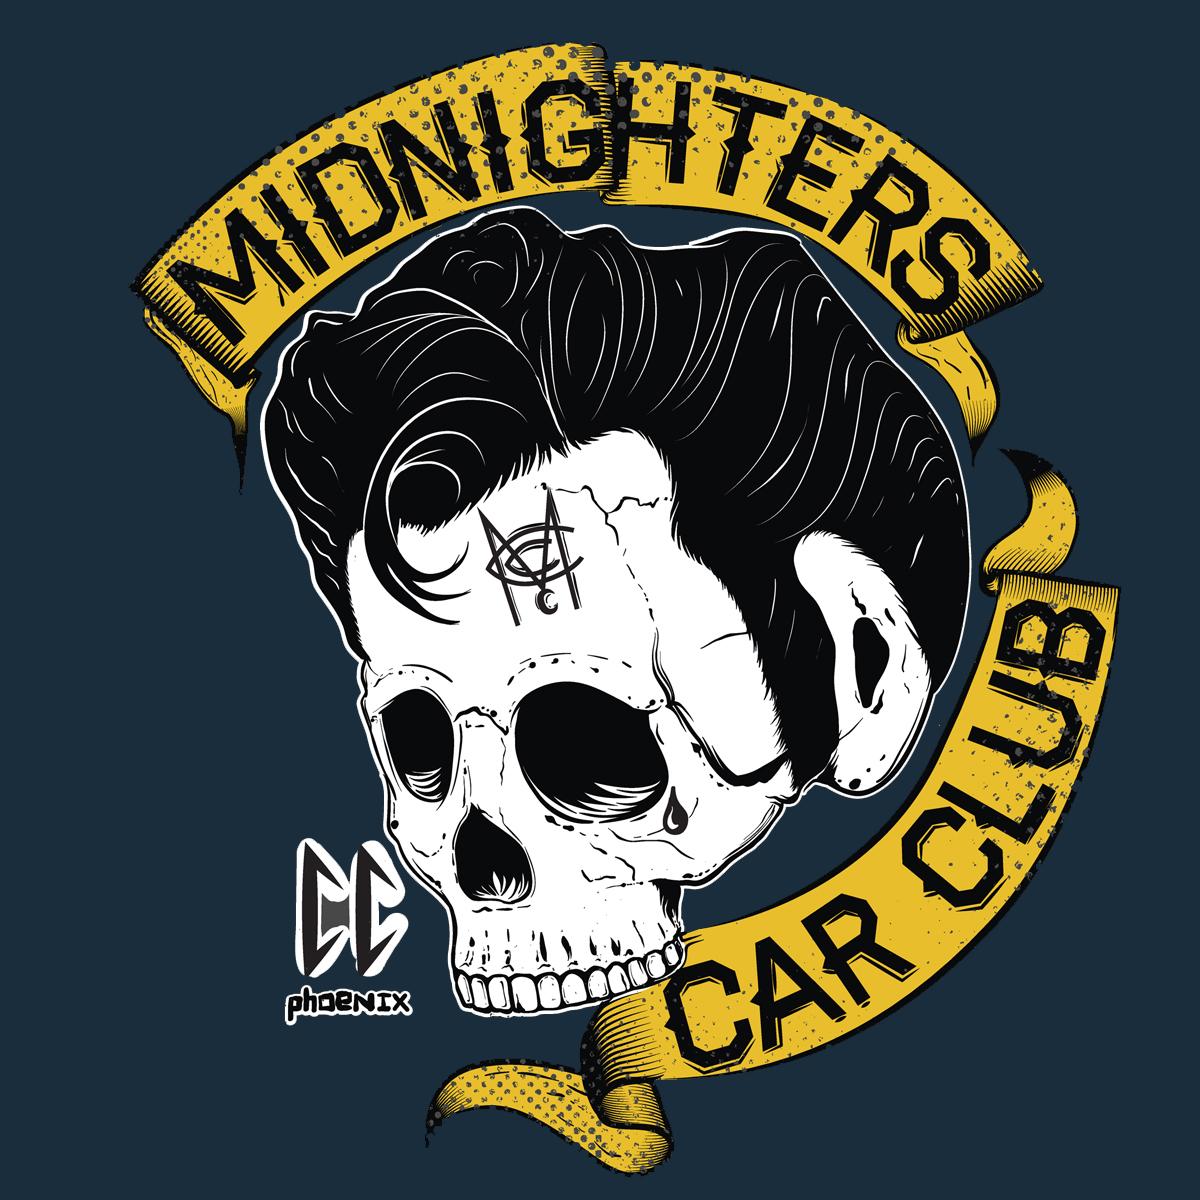 Midnighters2